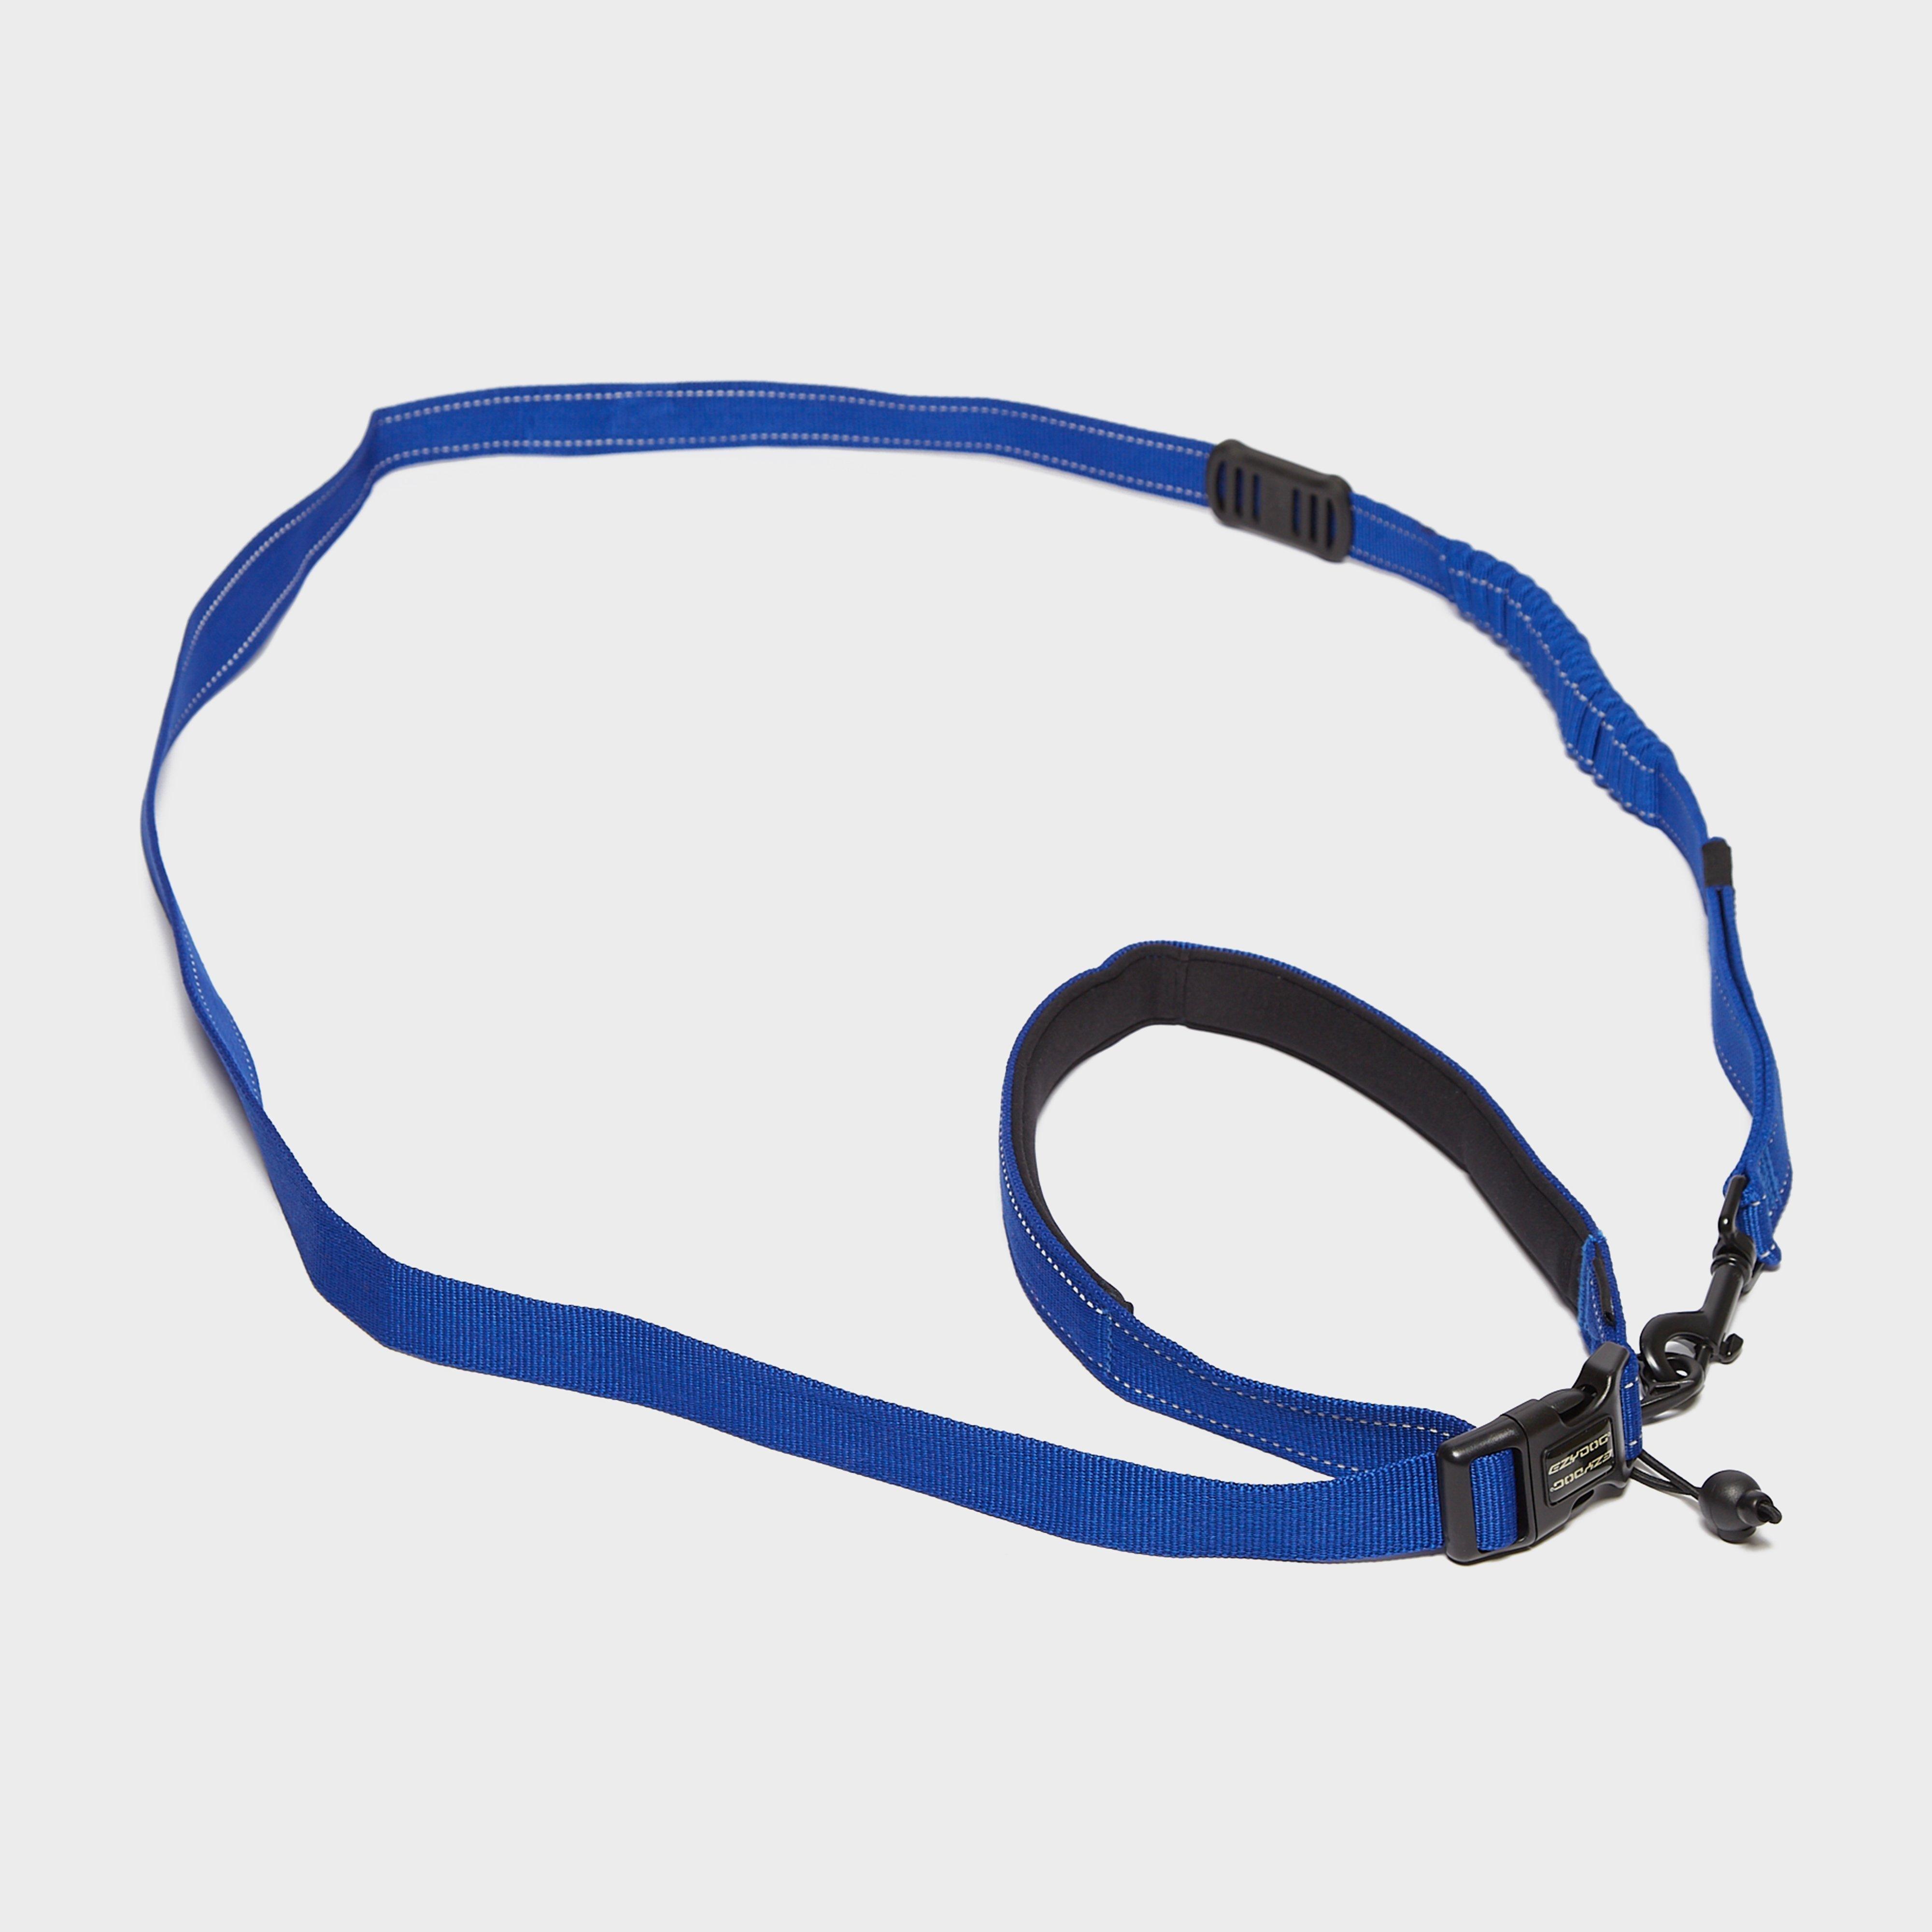 Image of Ezy-Dog Road Runner Lead - Blue/M, blue/M